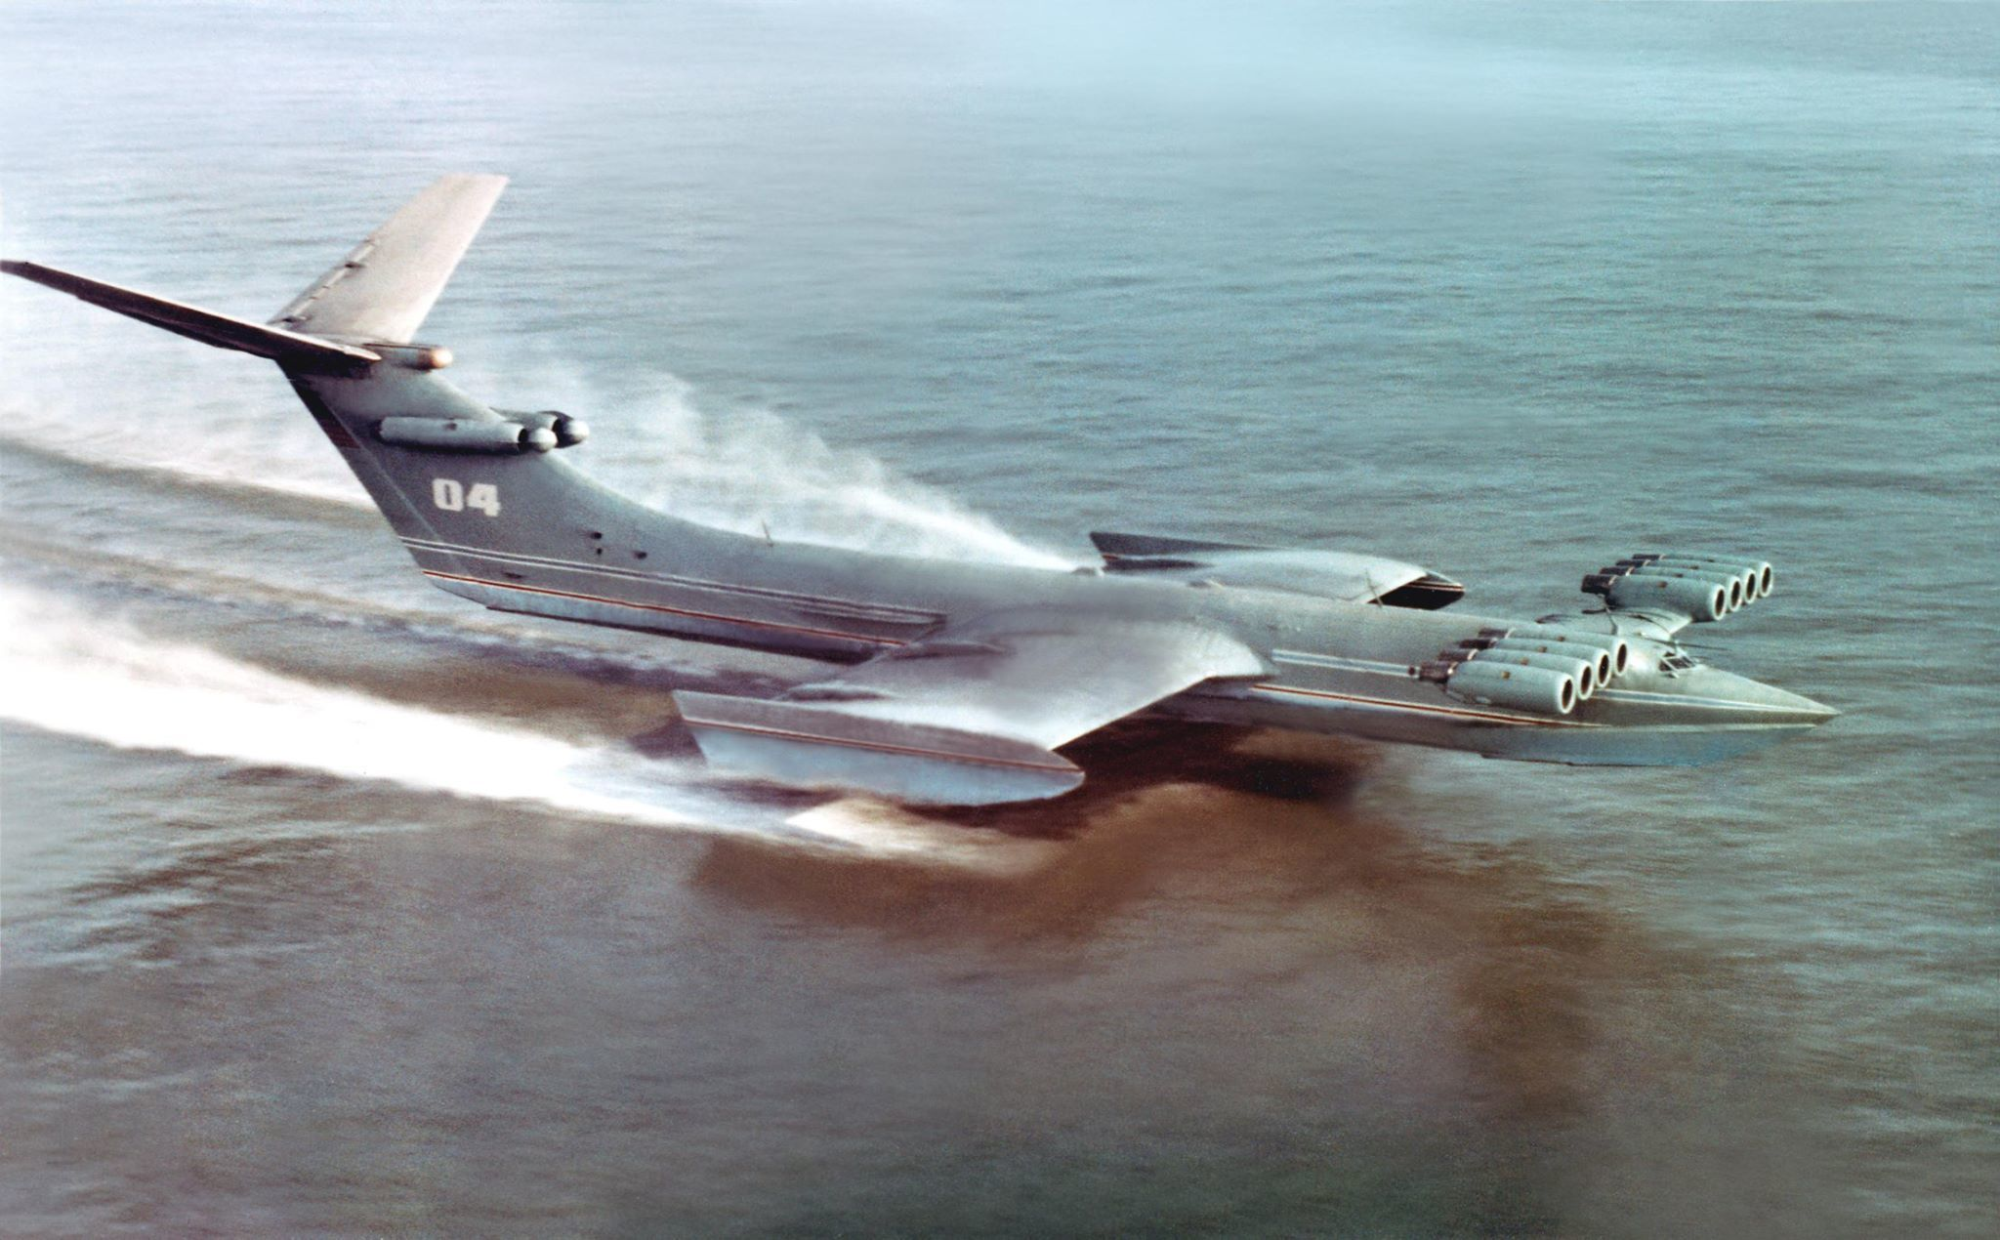 6d8231e6b3e8 Russland Støvet no Ekranoplan Sovjets Av Enorme Tu Børster RanRw4qPz